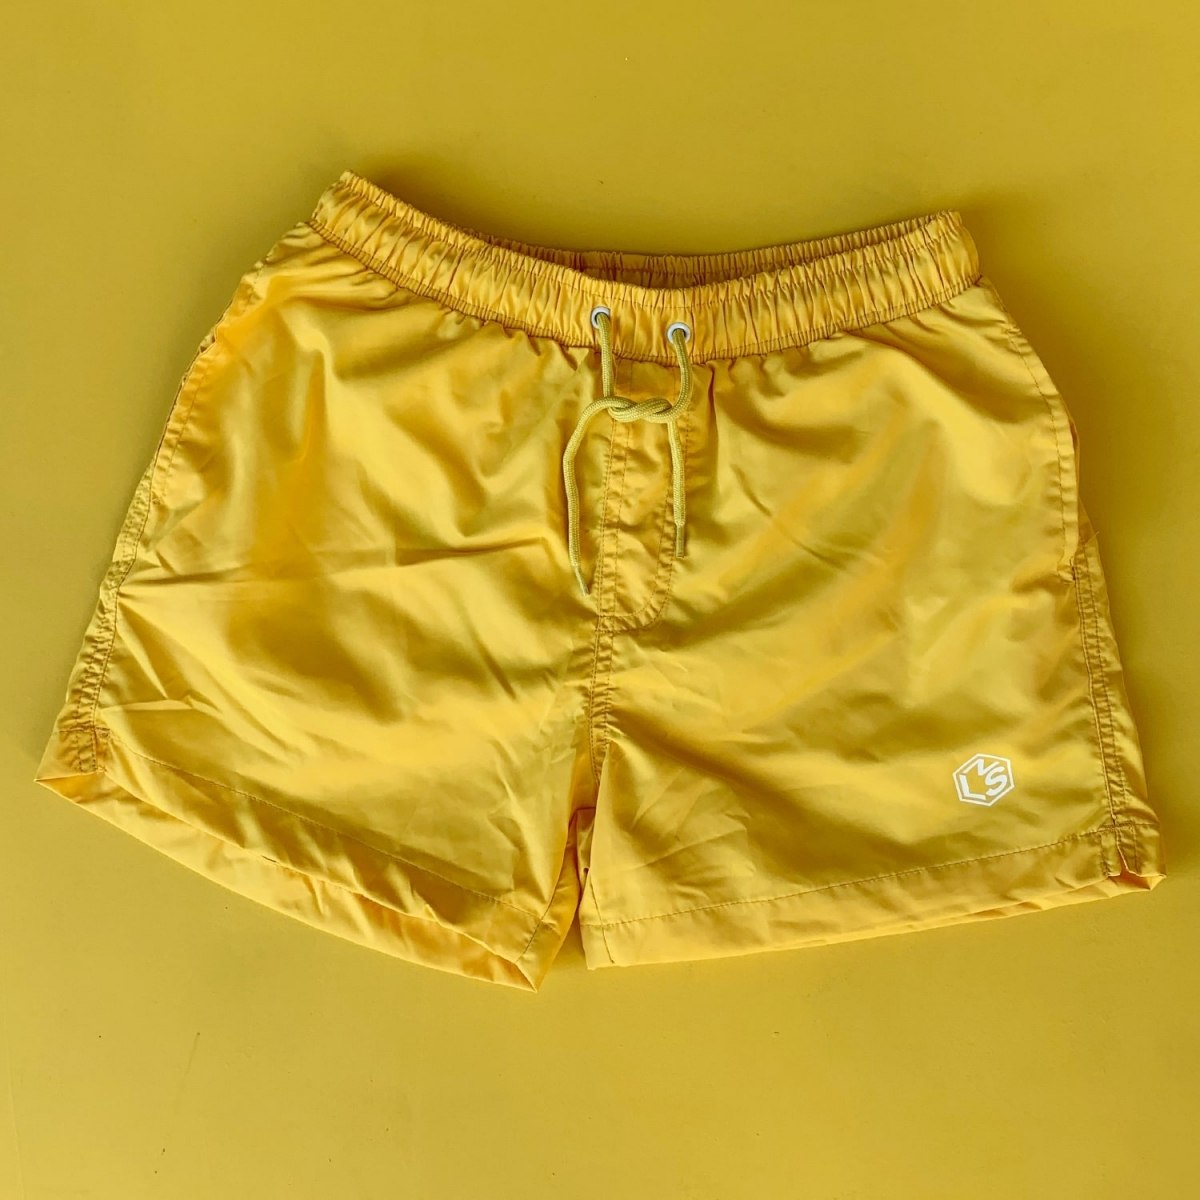 Men's Basic Short Swim Shorts With Back Pockets Yellow Mv Premium Brand - 1